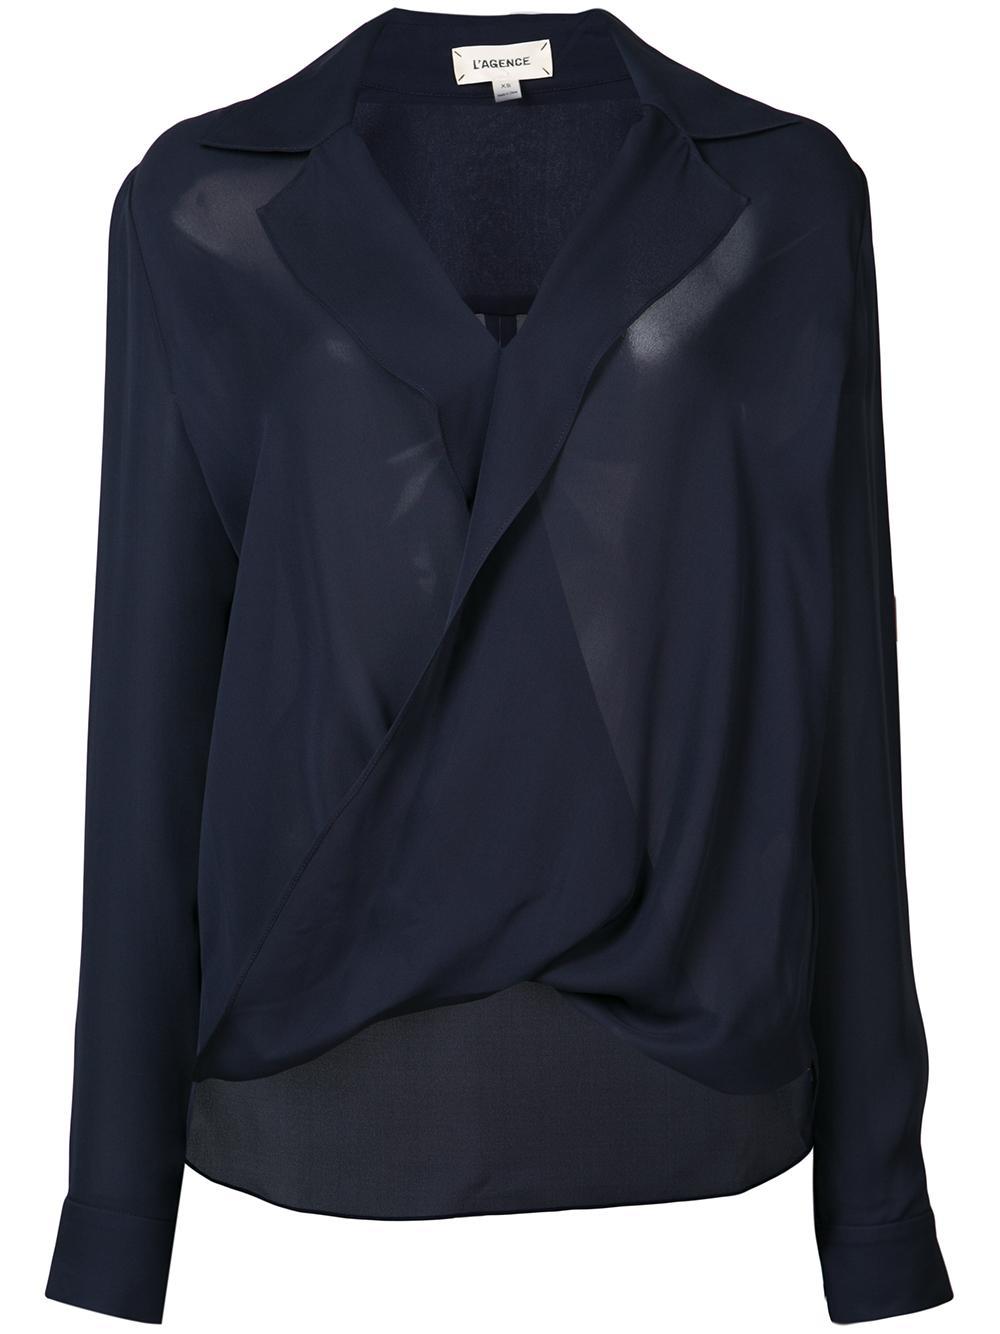 Rita Drape Front Blouse With Lapel Item # 4645 GG